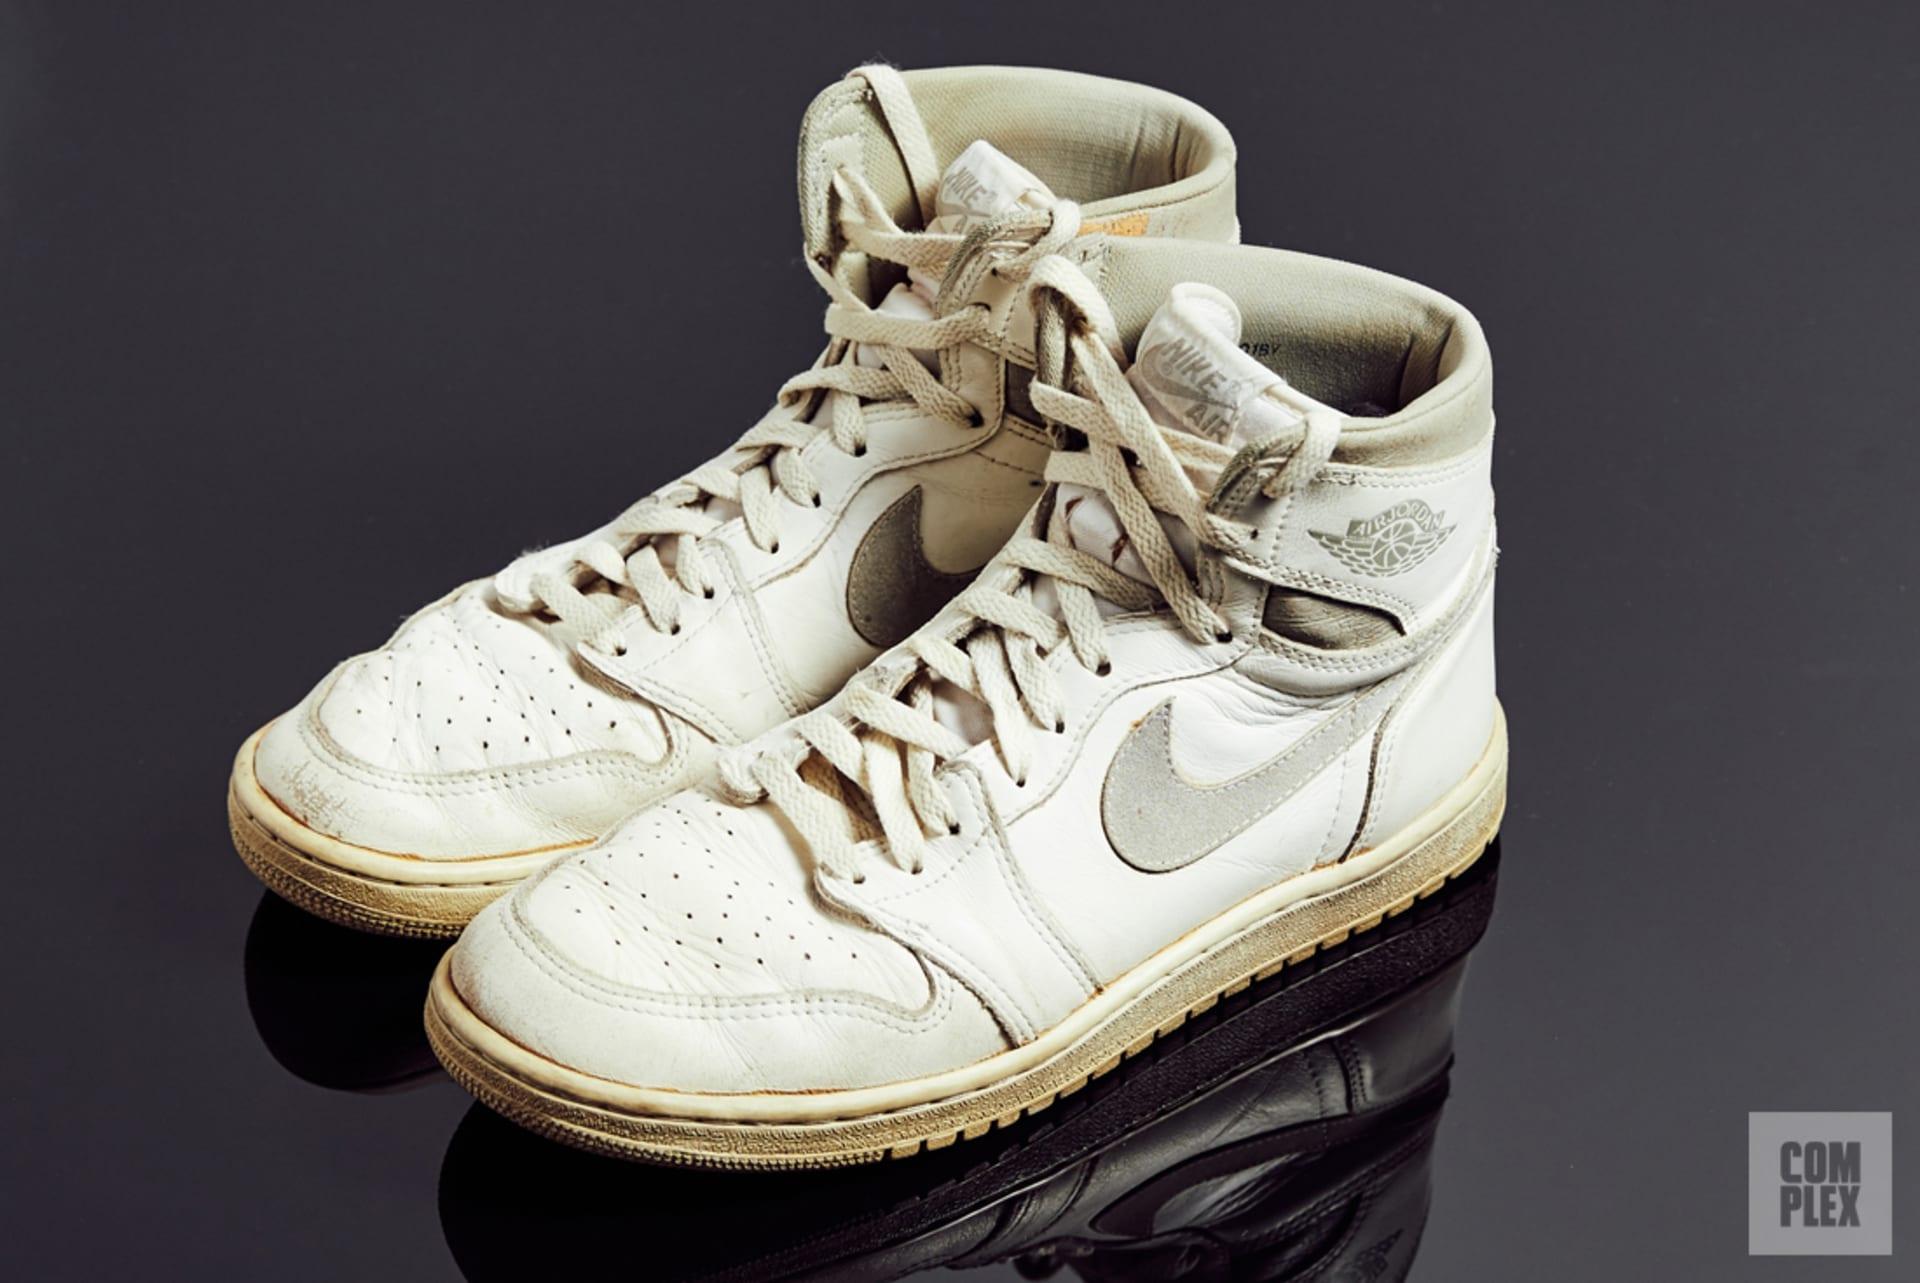 e9e3b588df554b Meet the 17-Year-Old With the Best O.G. Air Jordan 1 Collection ...